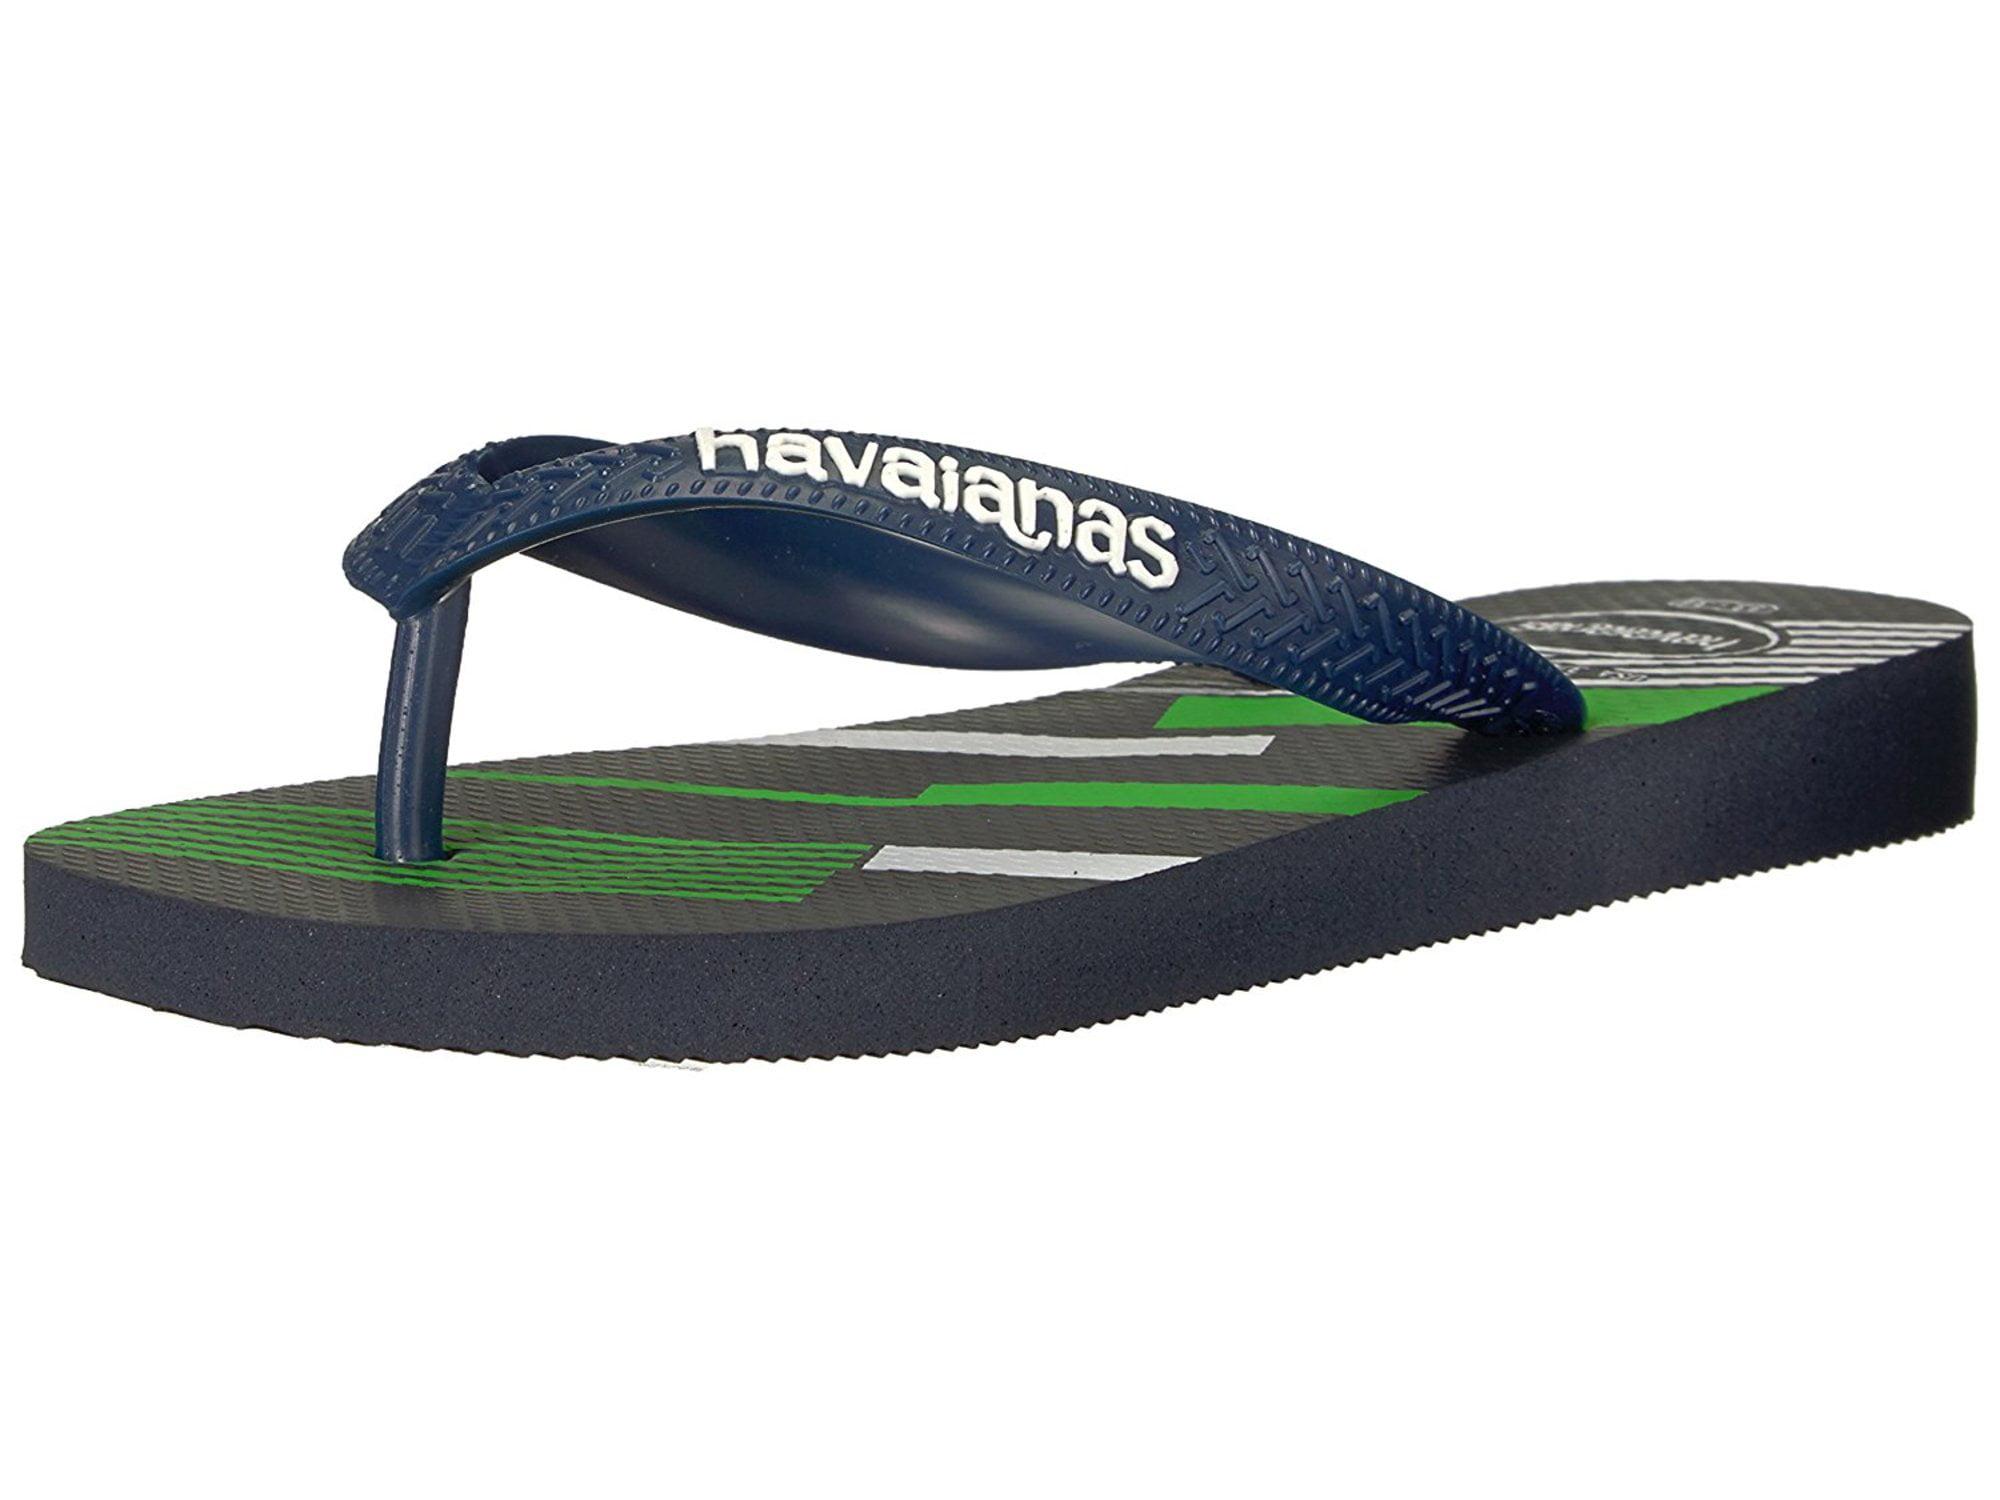 81c0059eb92d Havaianas Kid s Top Trend Sandal